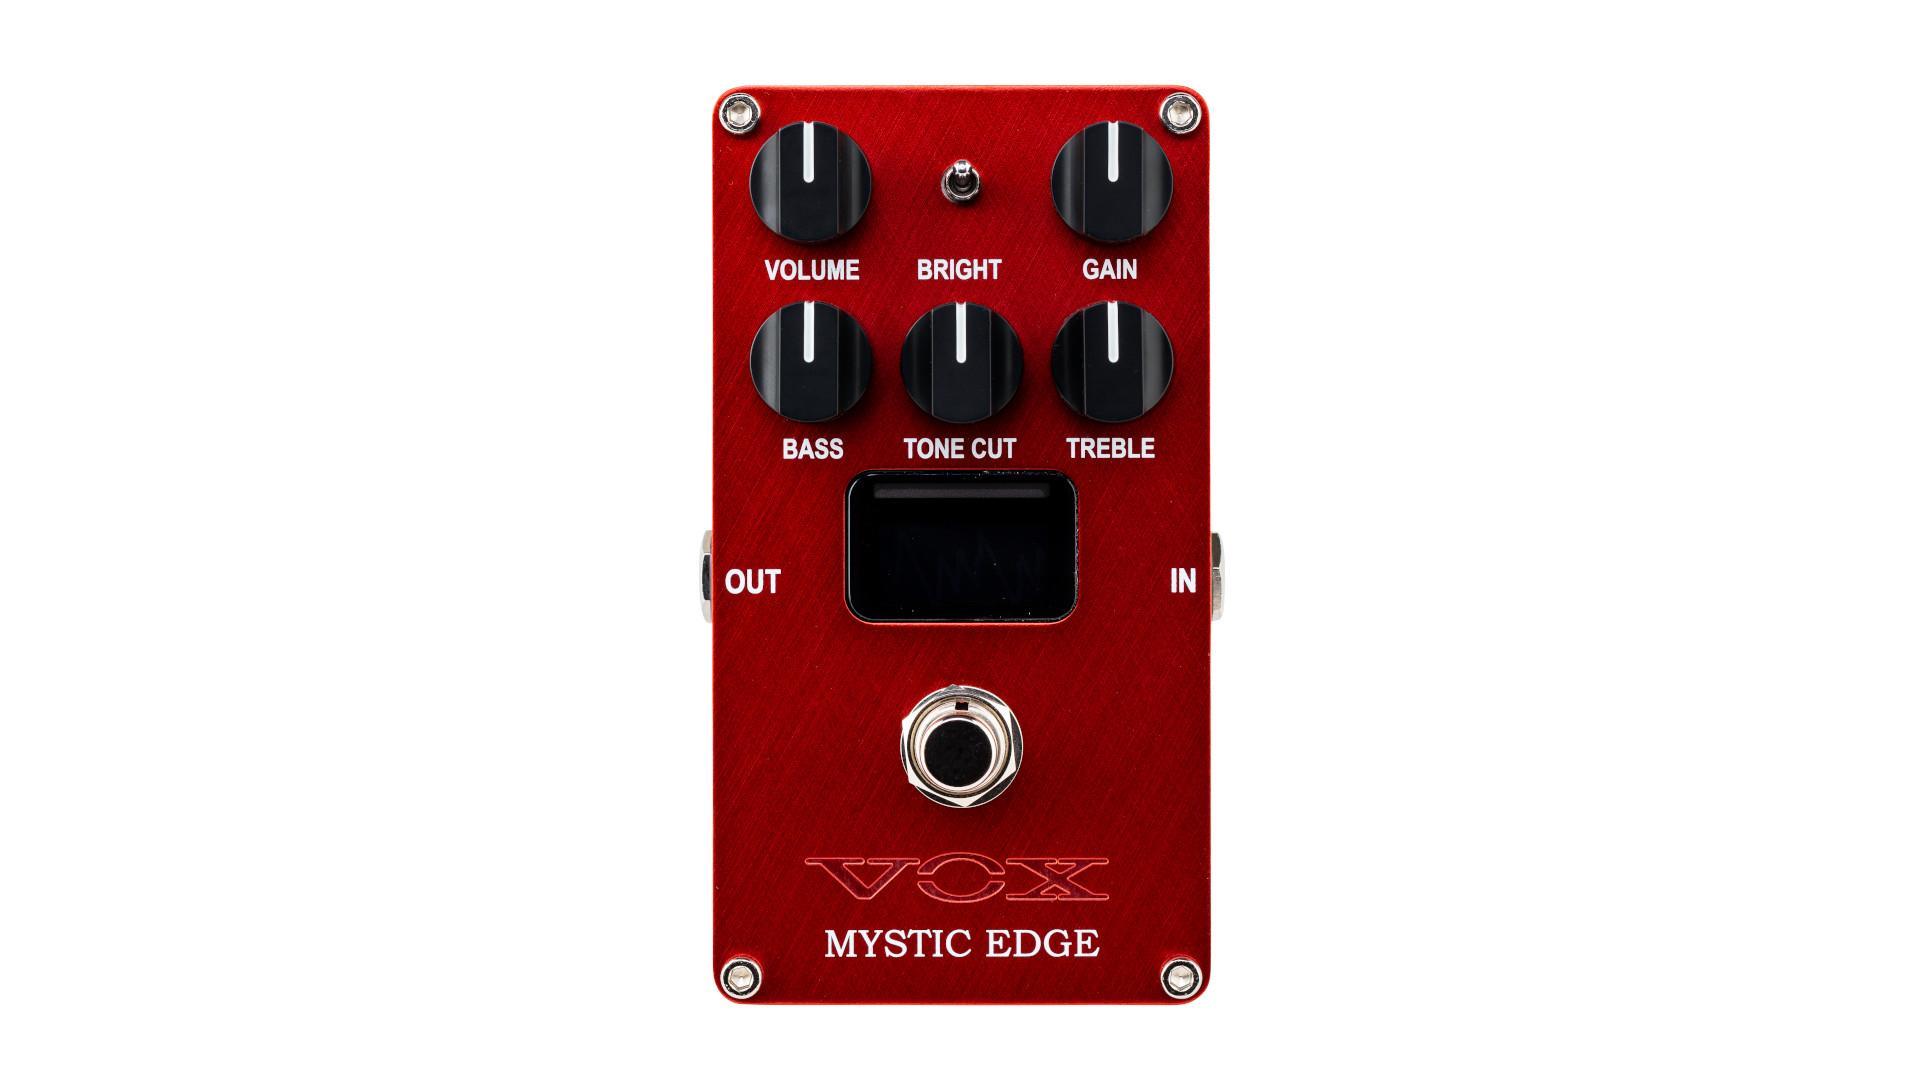 Mystic Edge